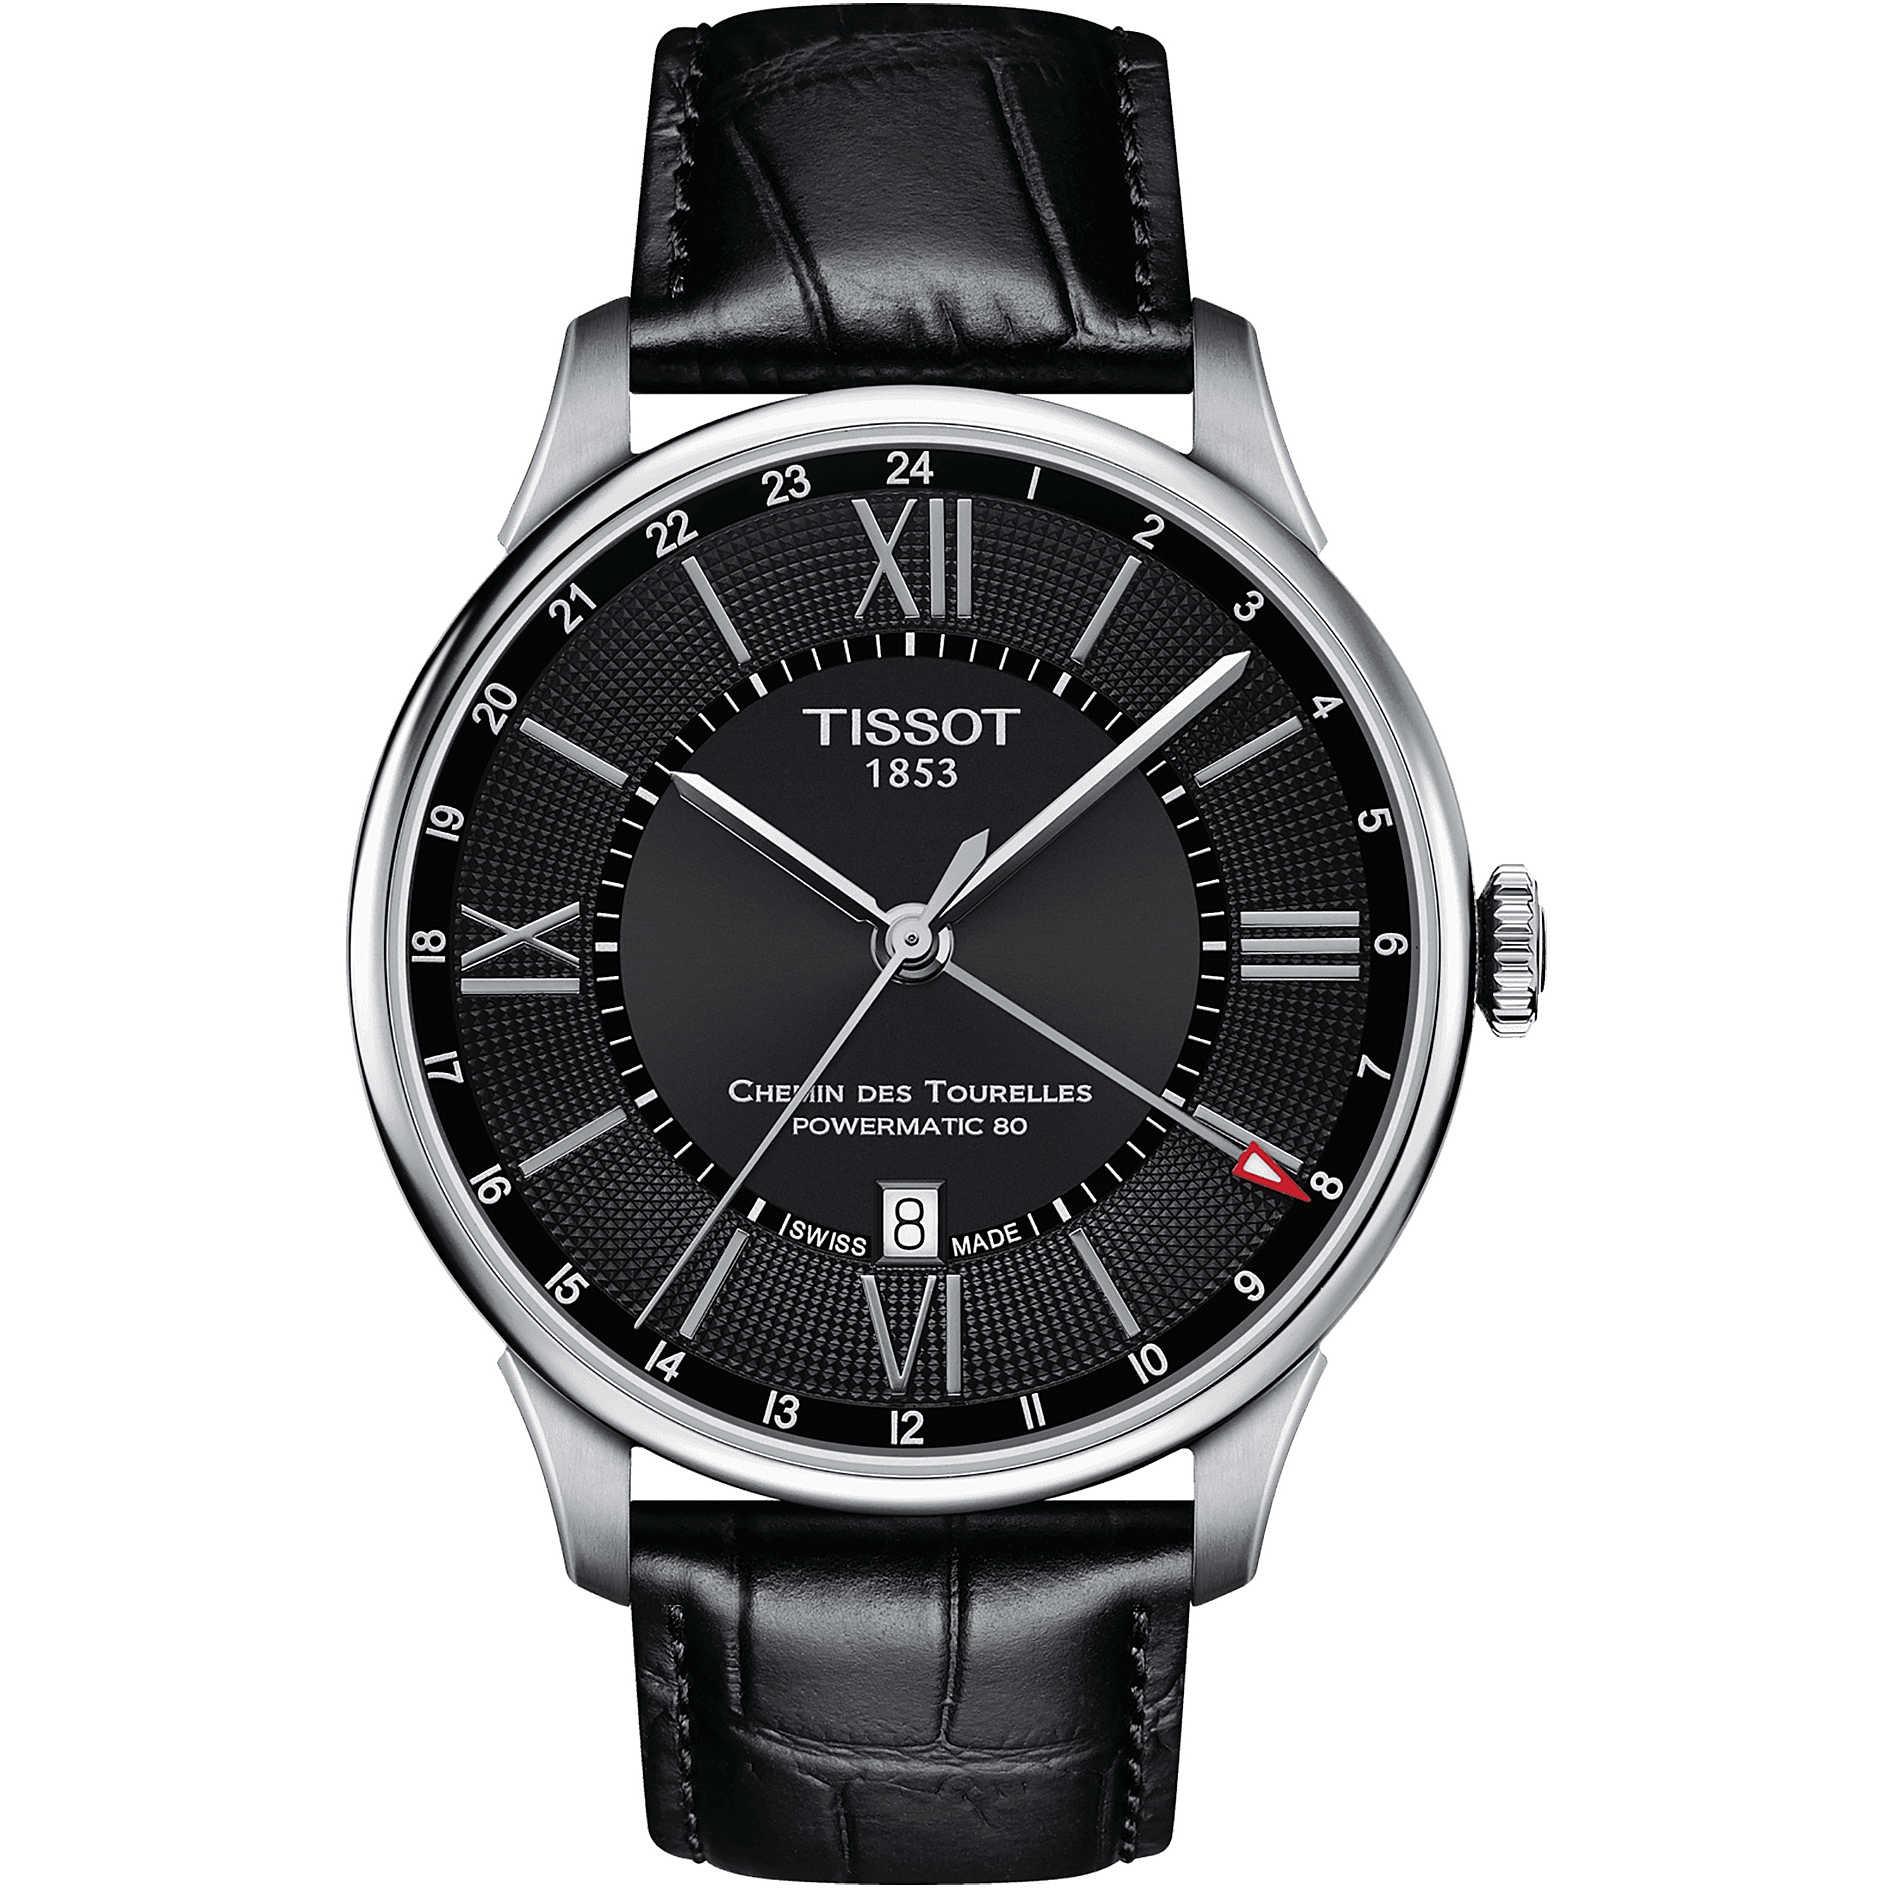 "Pánske hodinky Tissot ""CHEMIN DES TOURELLES POWERMATIC 80 GMT"""